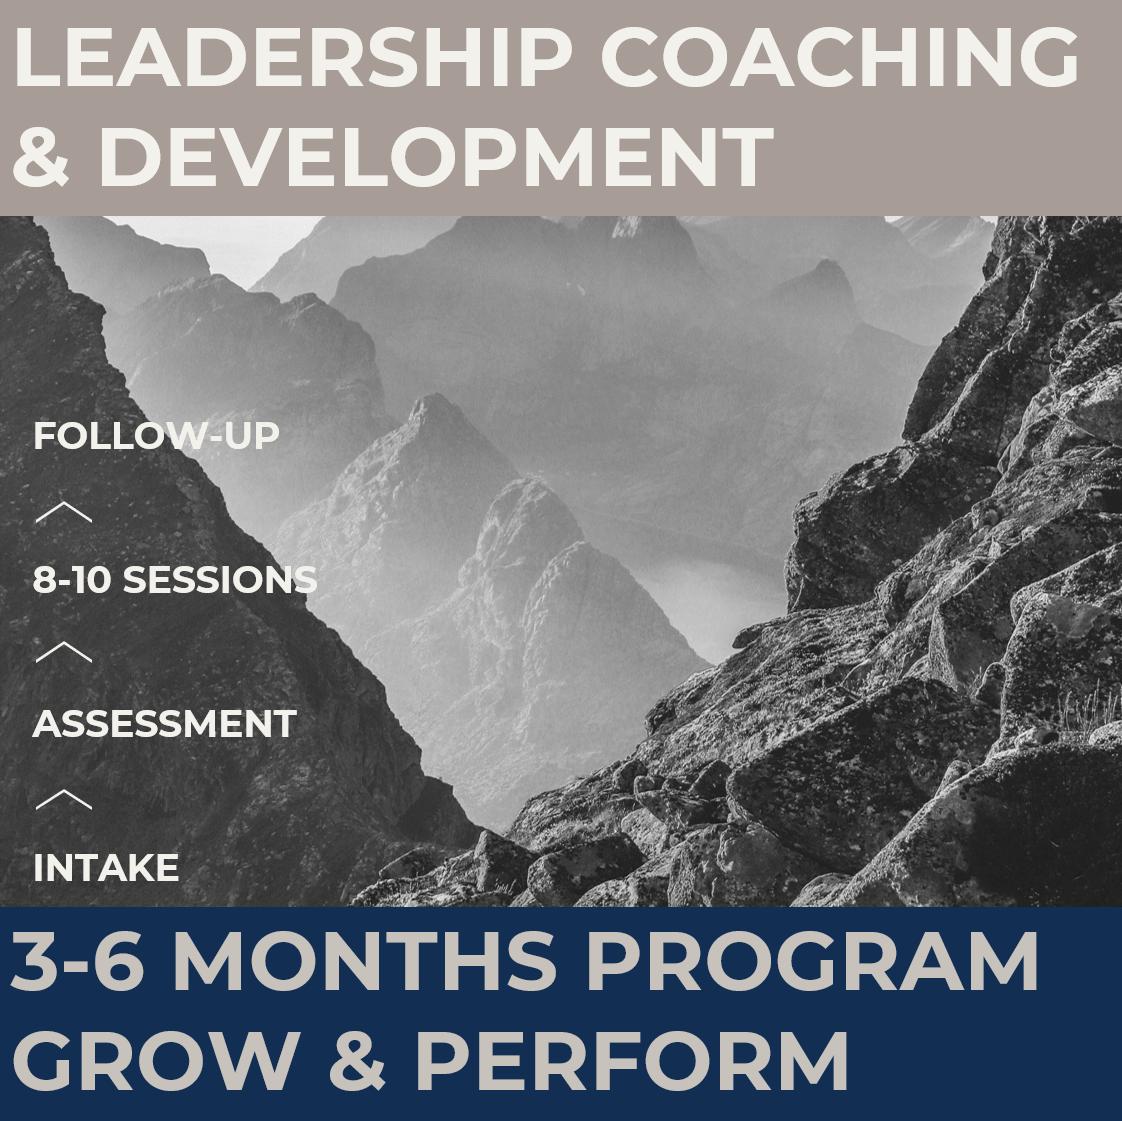 leadership coaching development executive assessment